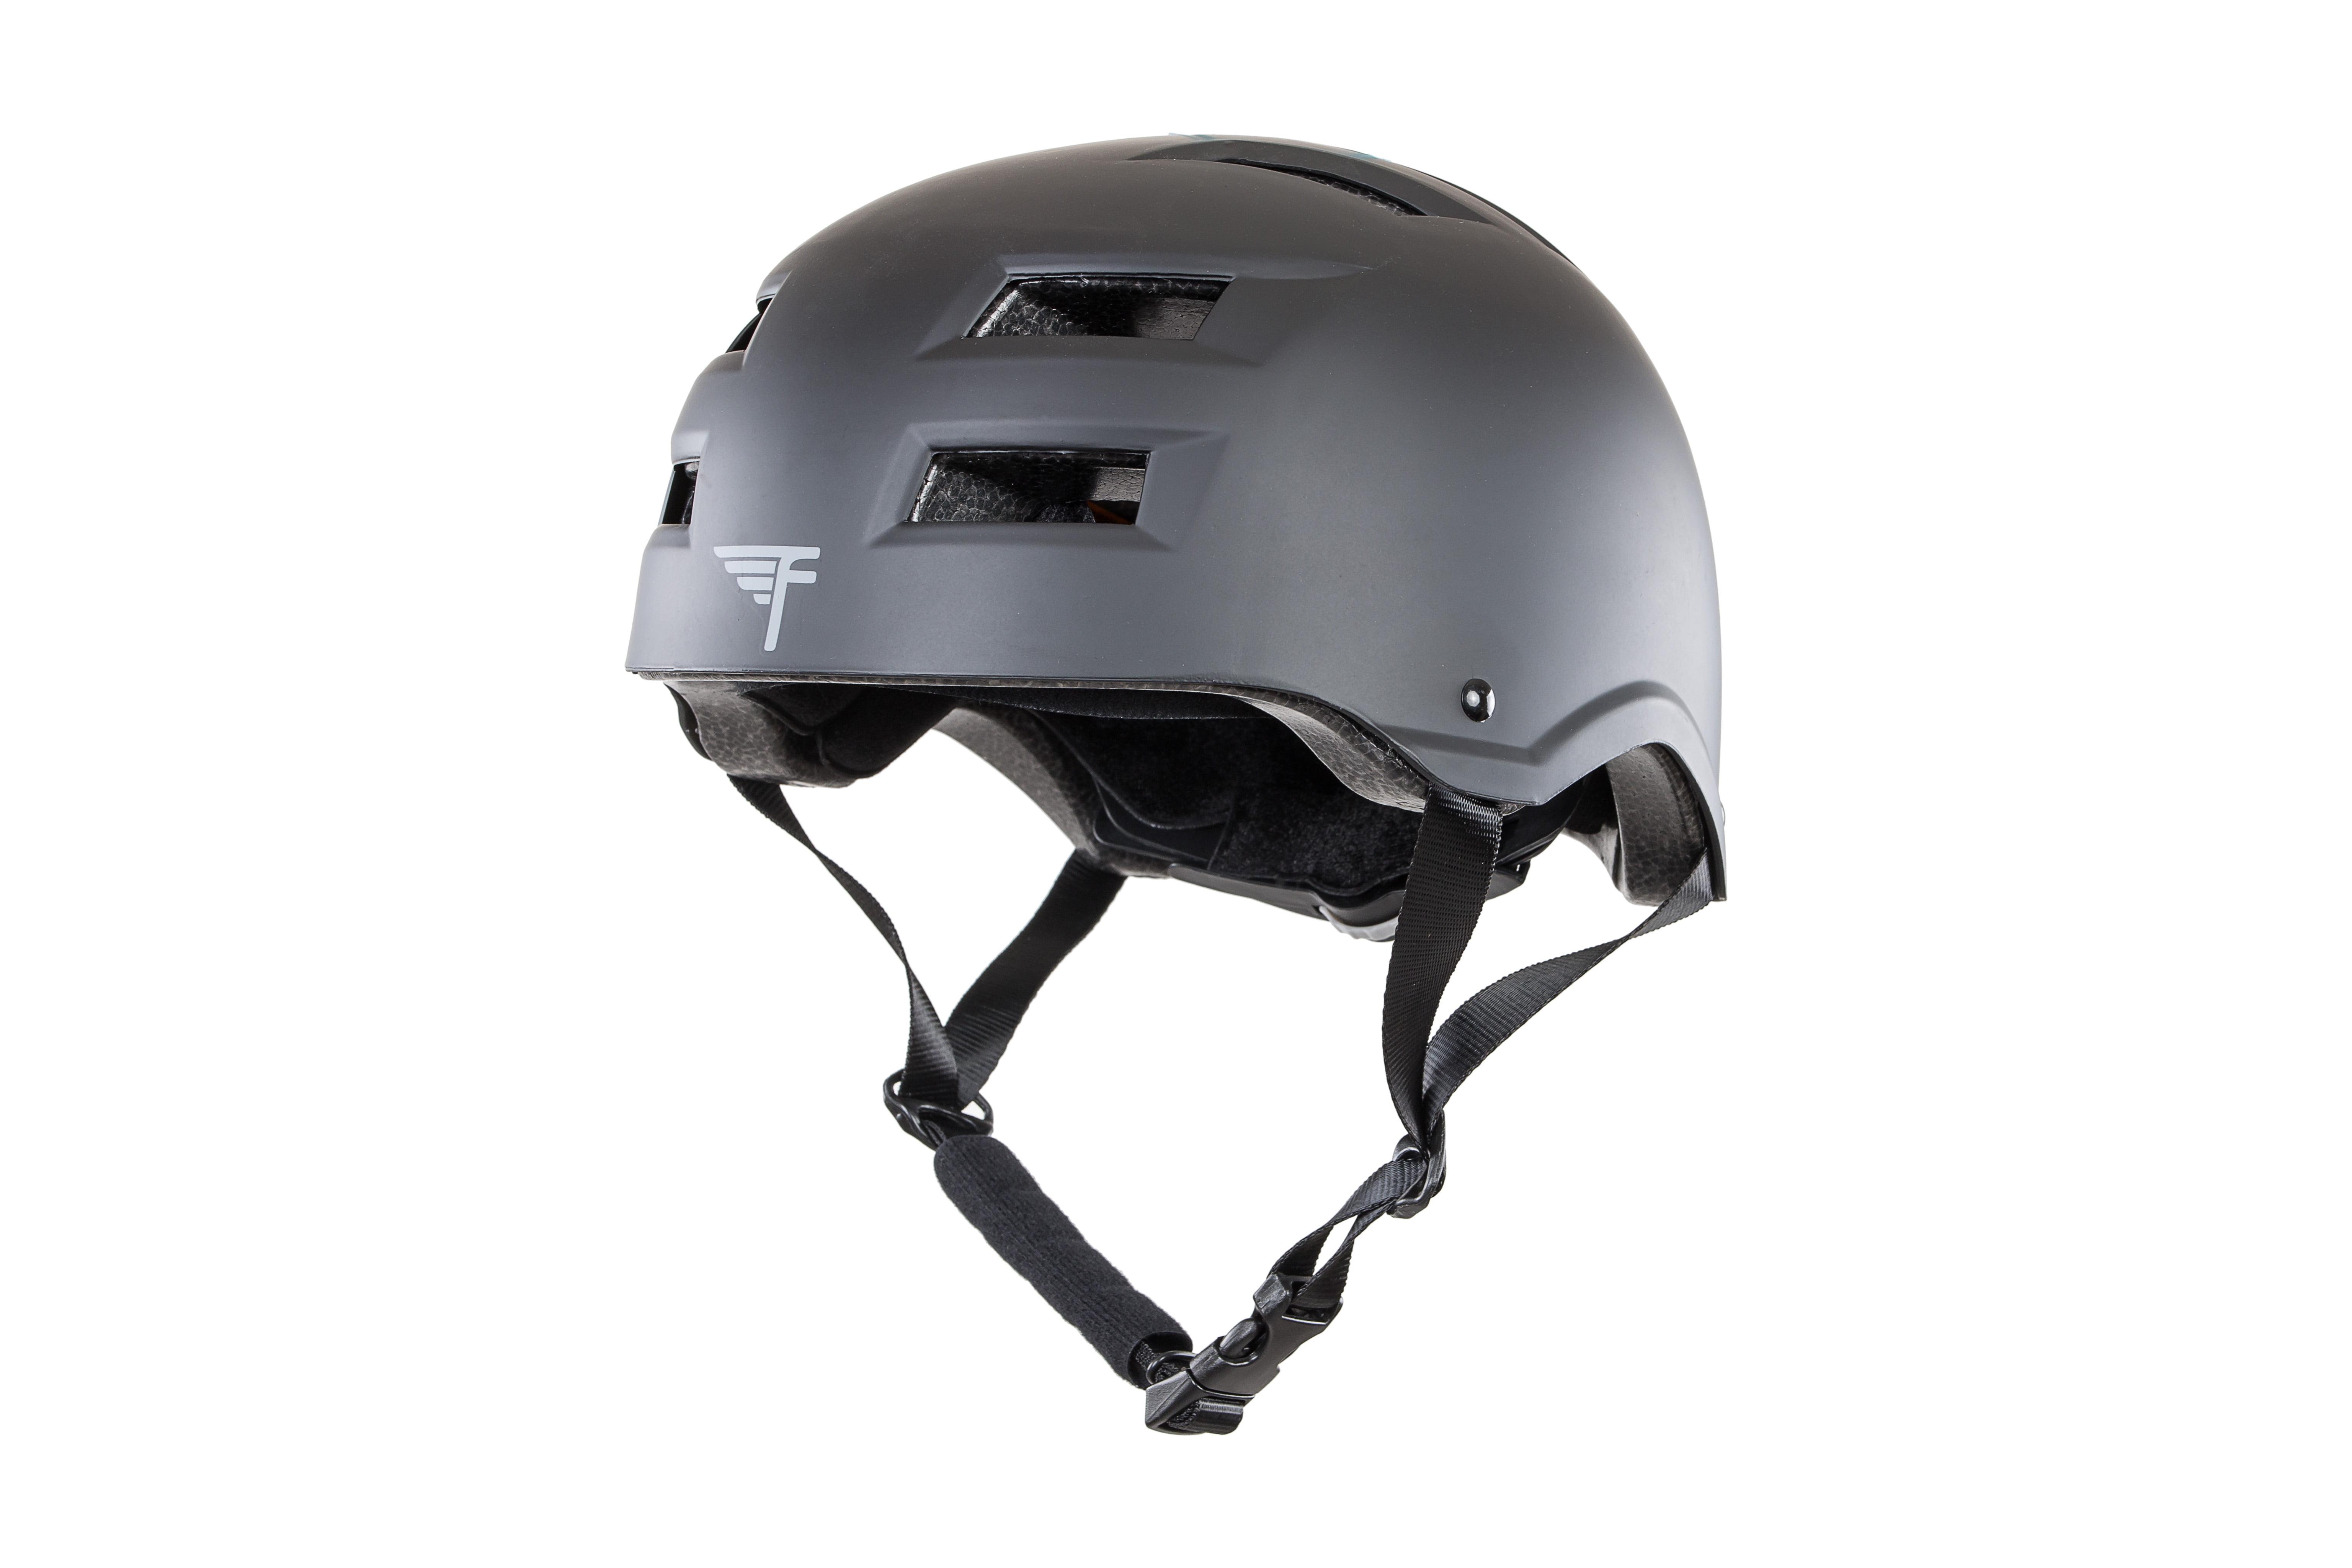 Flybar Certified Multi Sport Helmets For Skateboarding, Bicycling, Roller Blading, Longboarding & Pogoing -Cloud... by